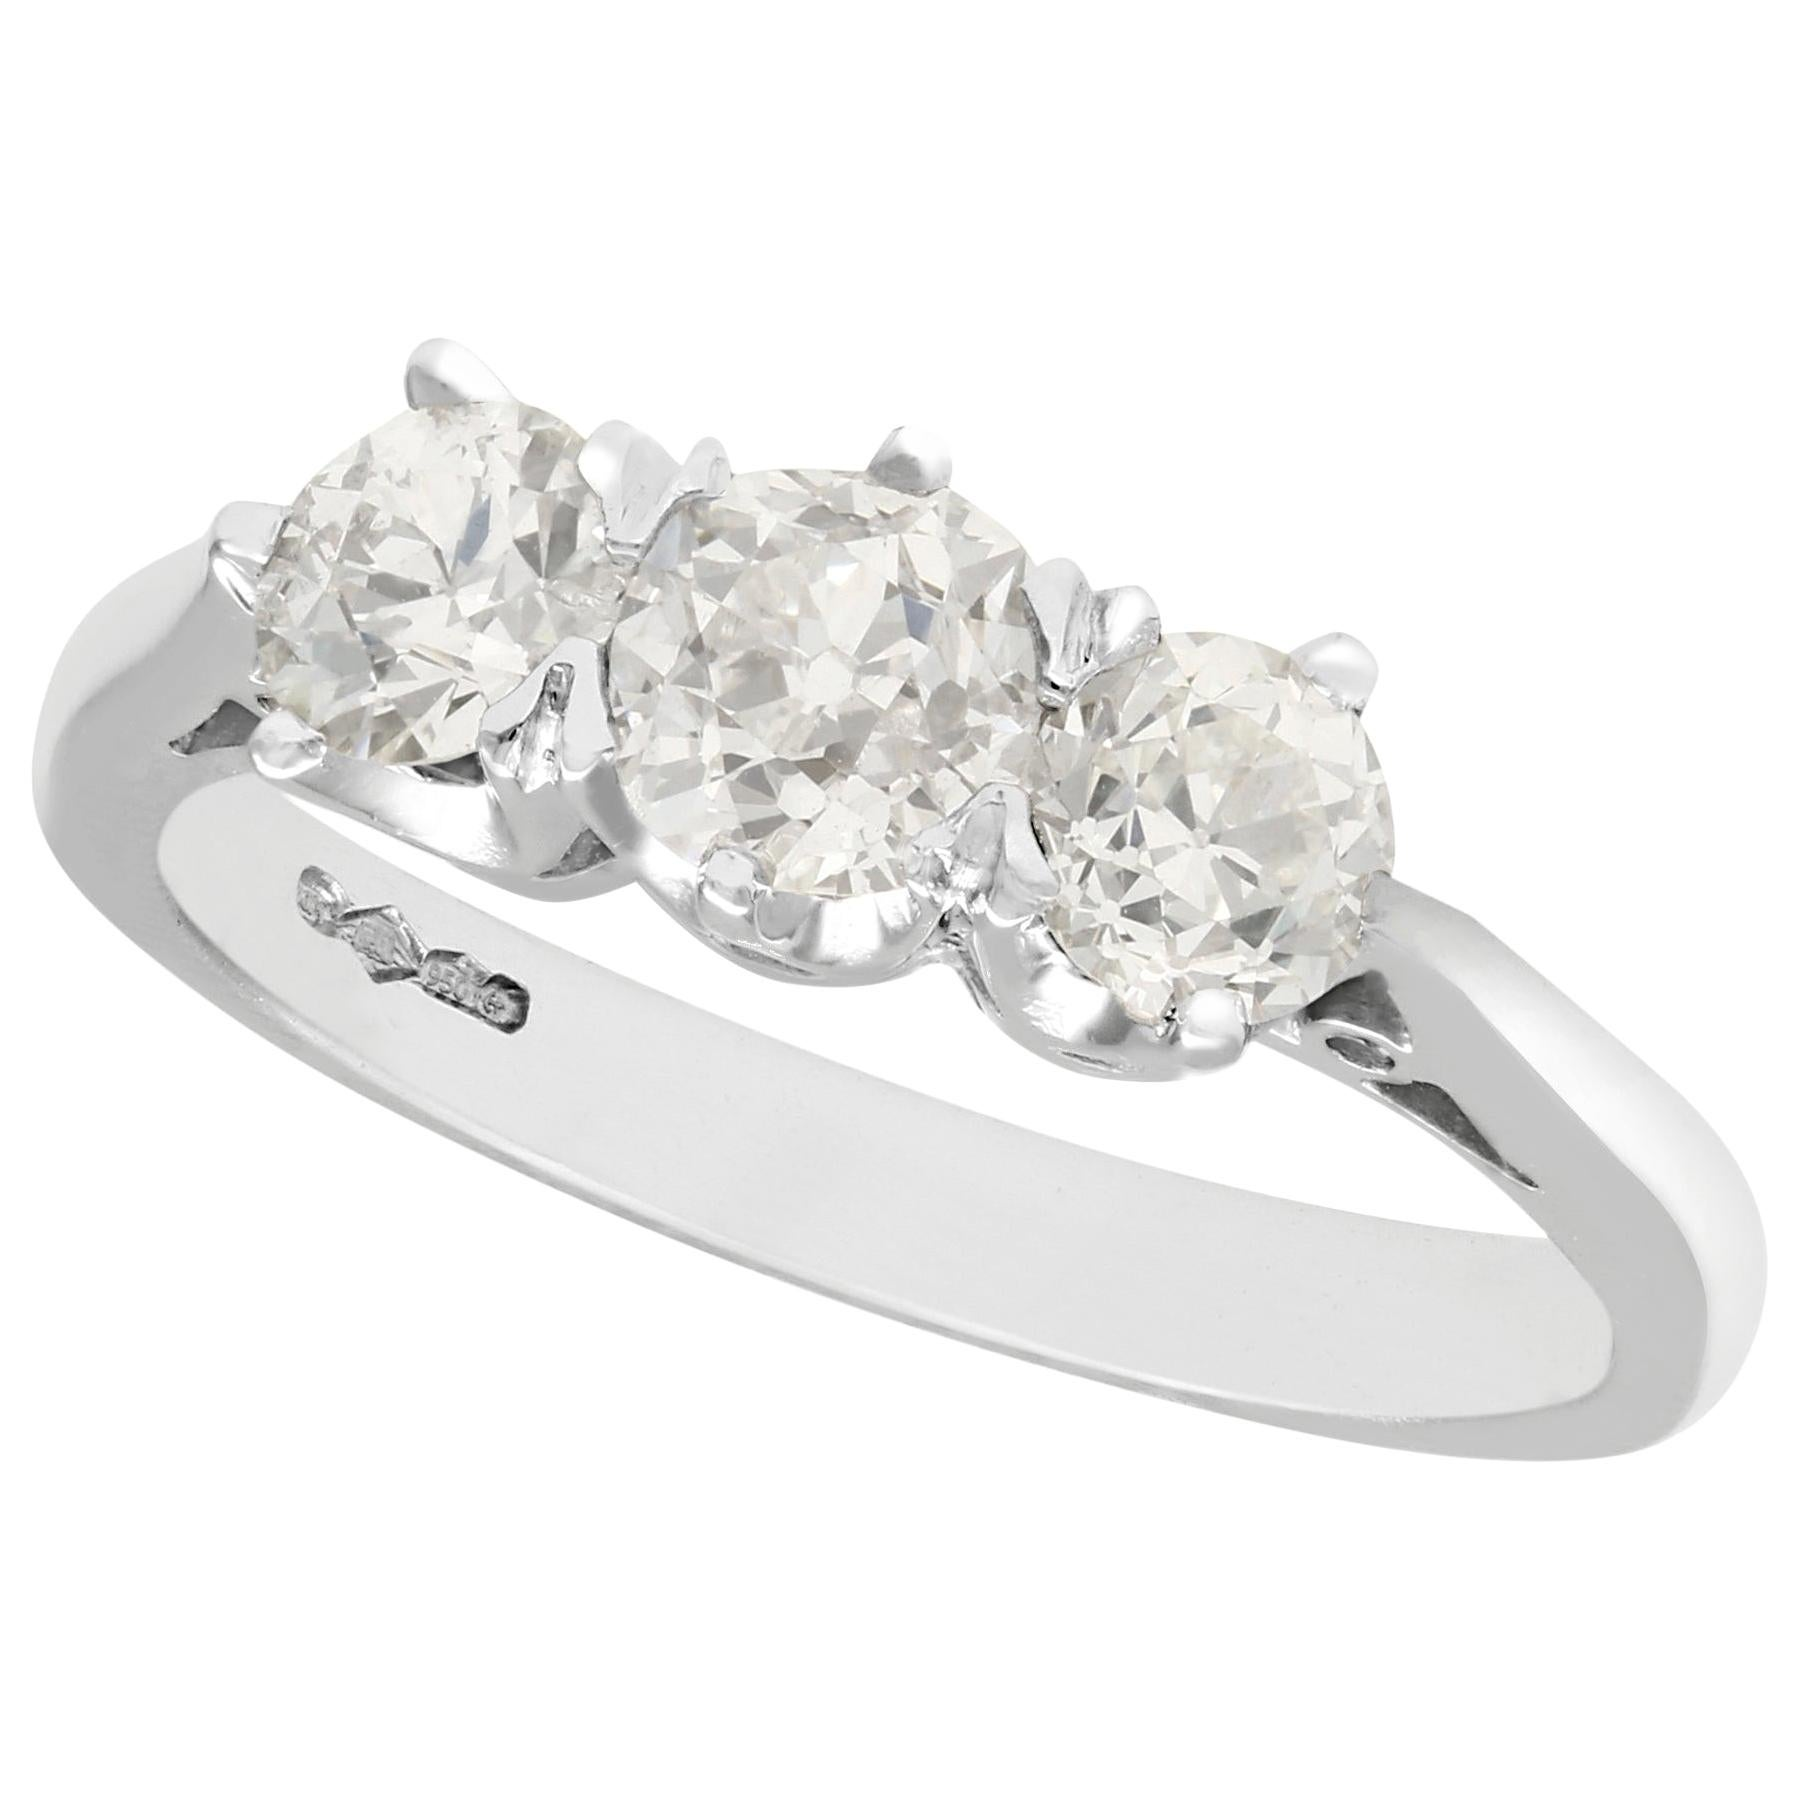 1.47 Carat Diamond Platinum Three-Stone Engagement Ring